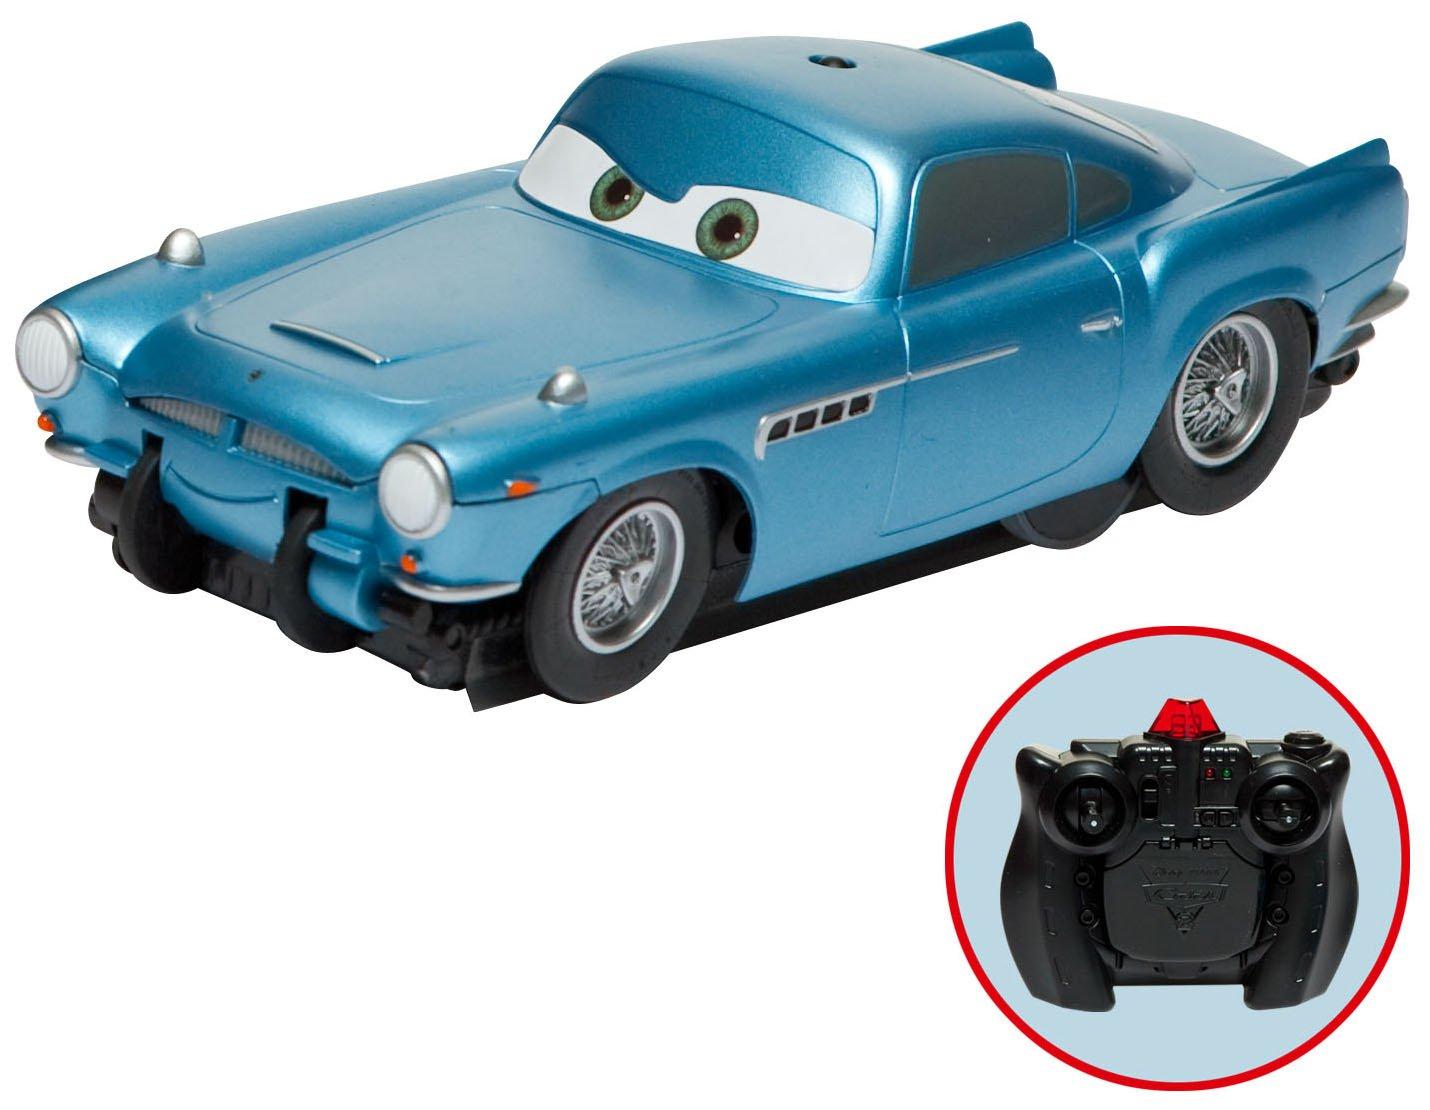 Uncategorized Finn Mcmissile Car amazon com cars 2 finn mcmissile zero gravity vehicle toys games